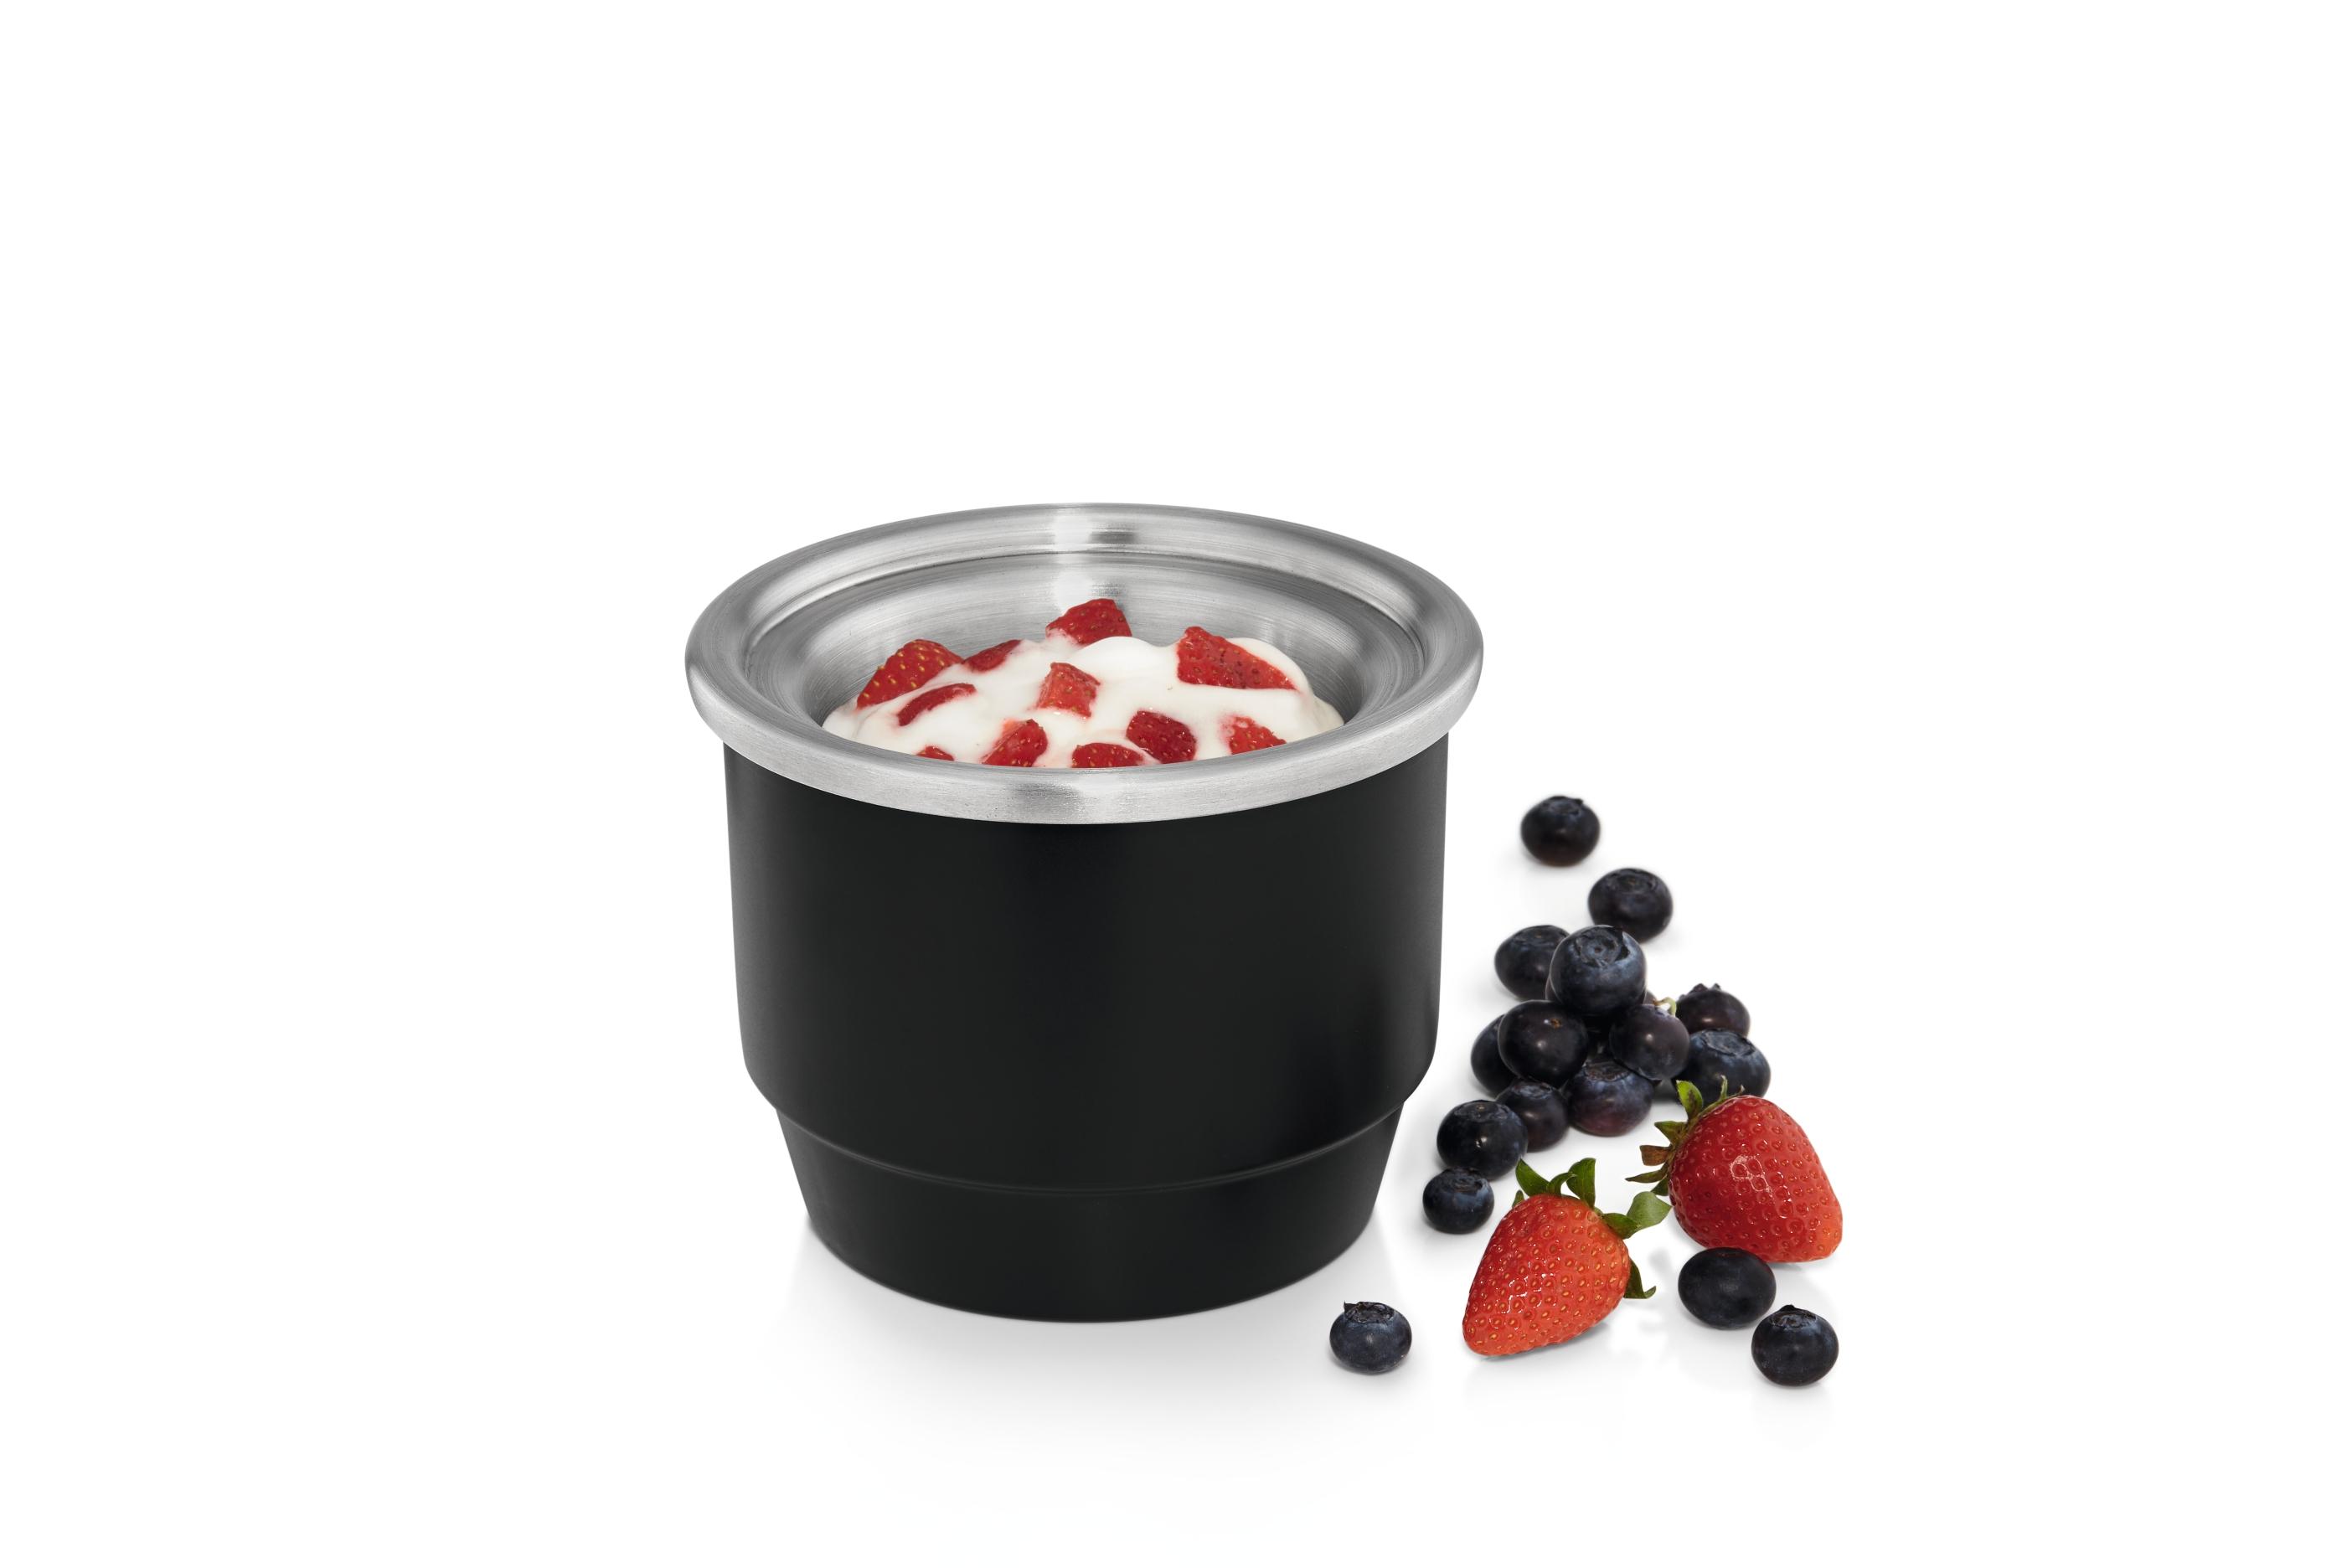 WMF KITCHENminisⓇ Dondurma Makinesi